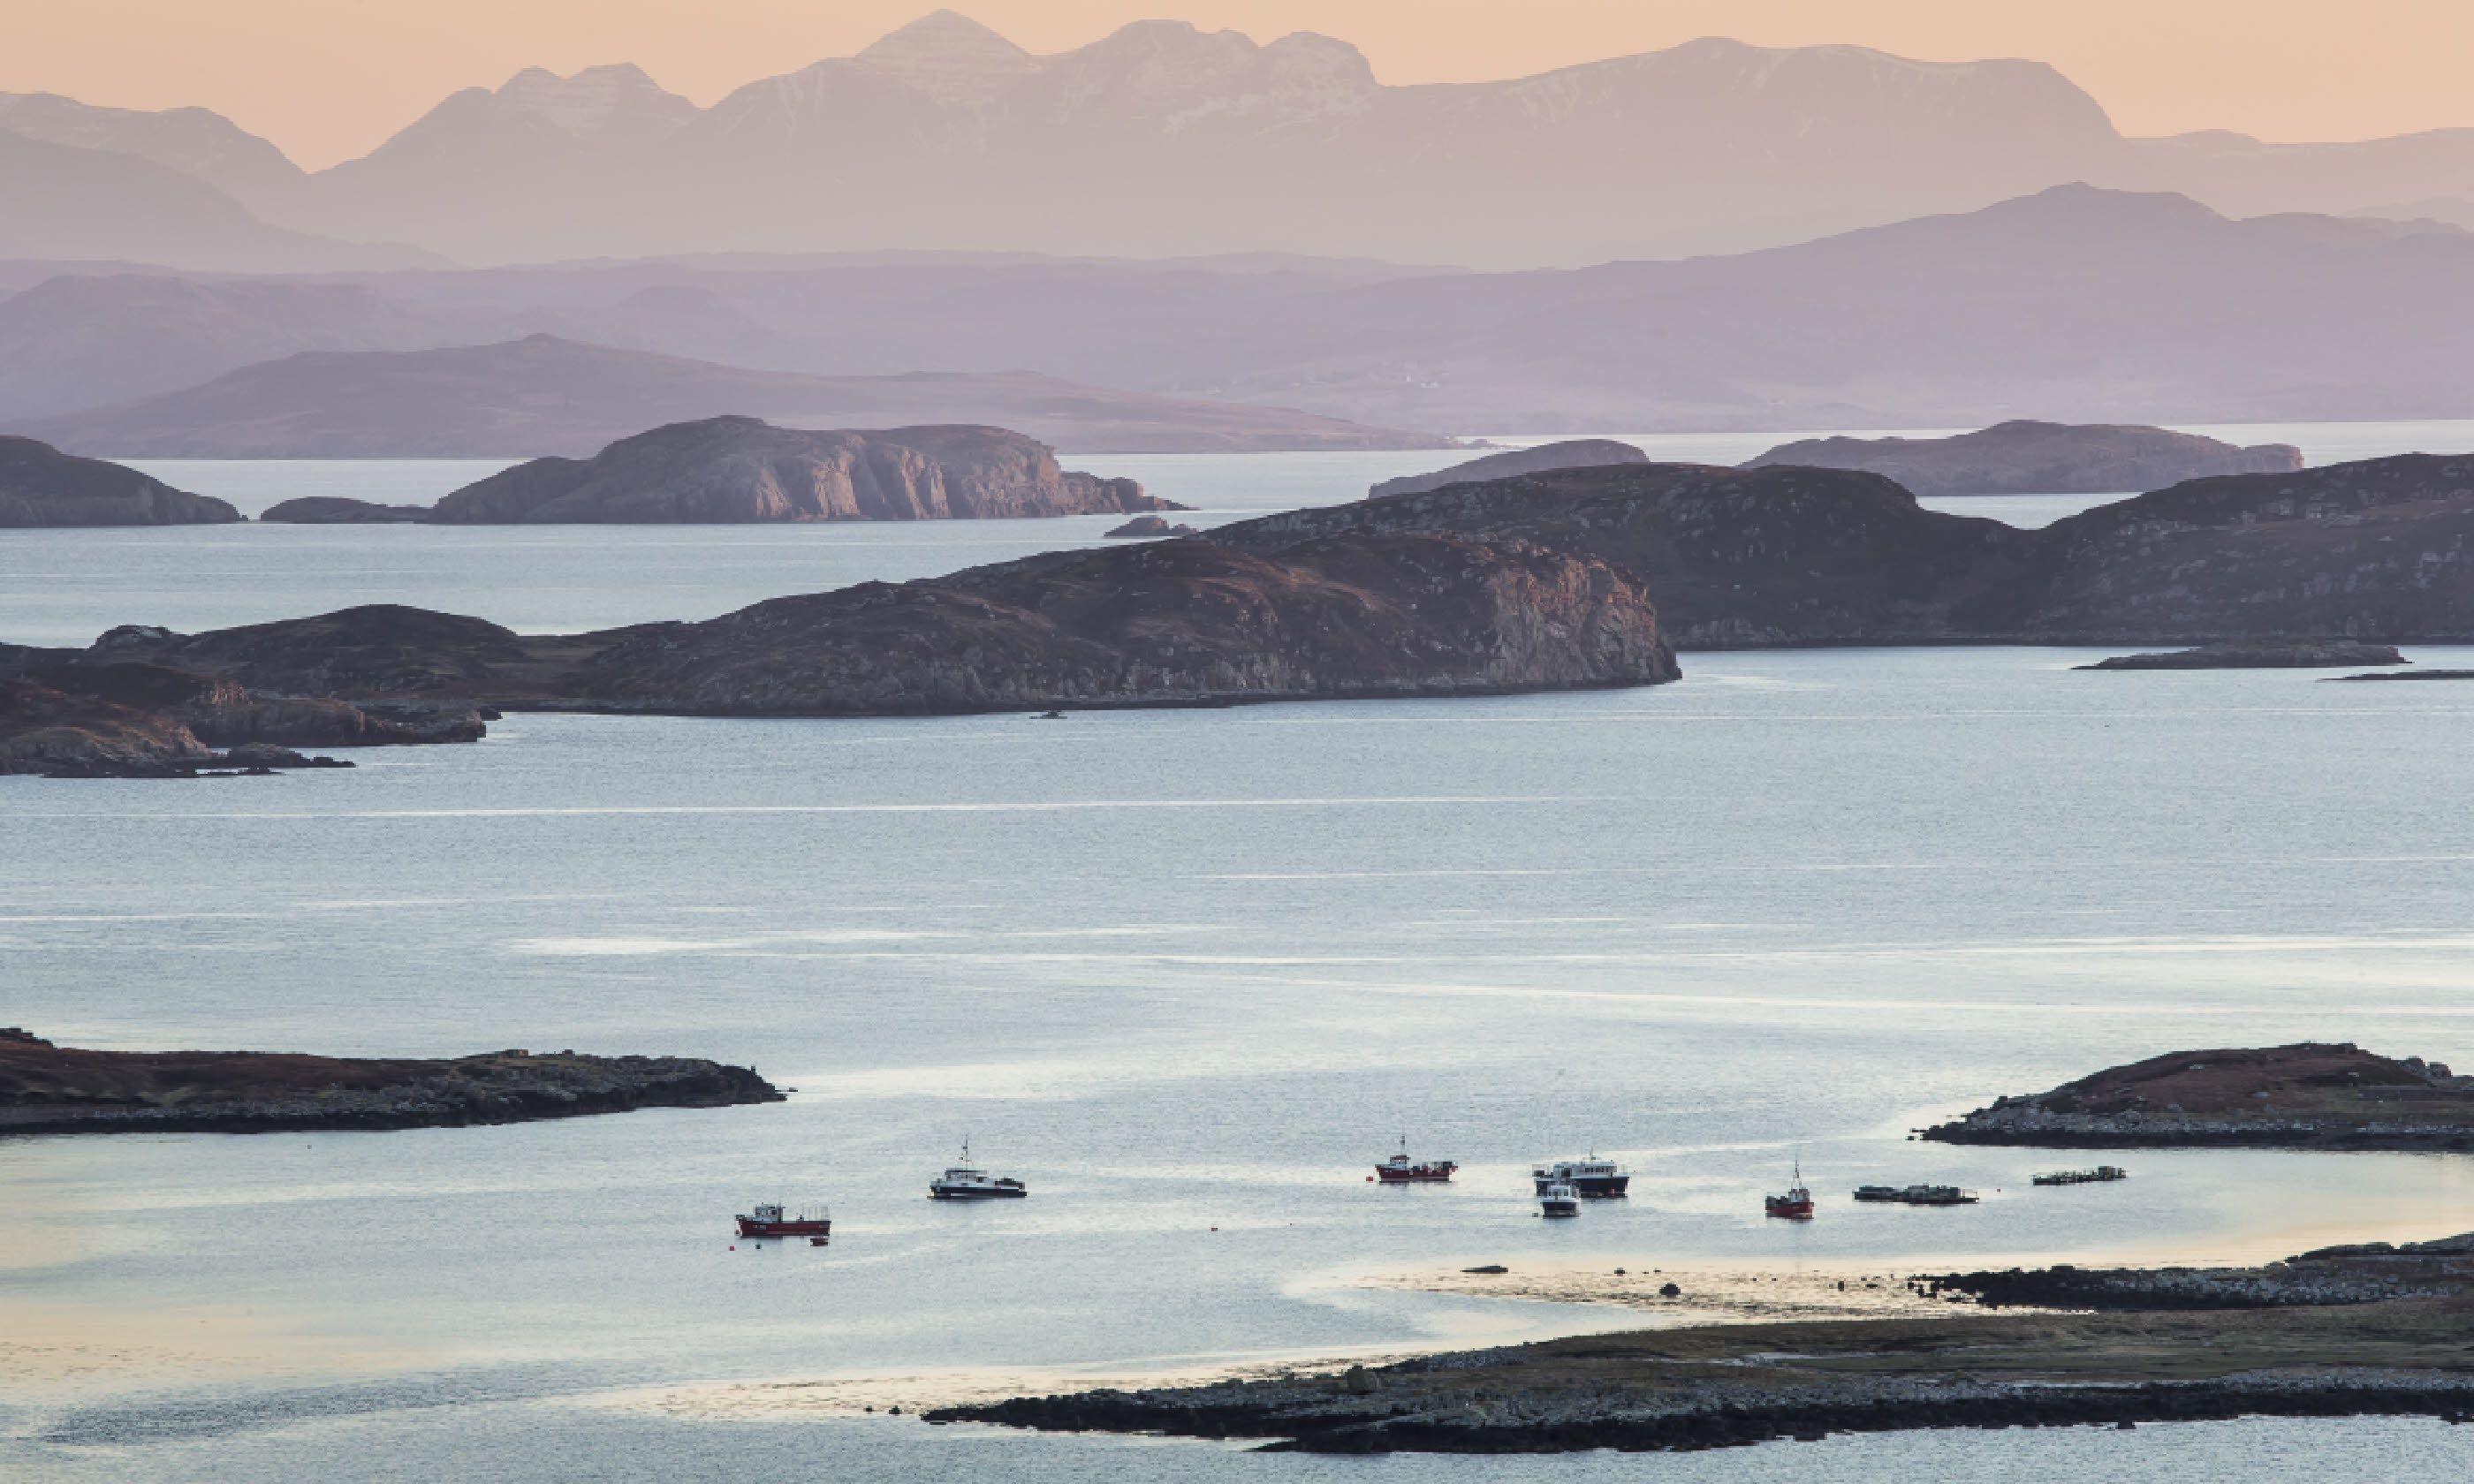 Summer Isles (Shutterstock)